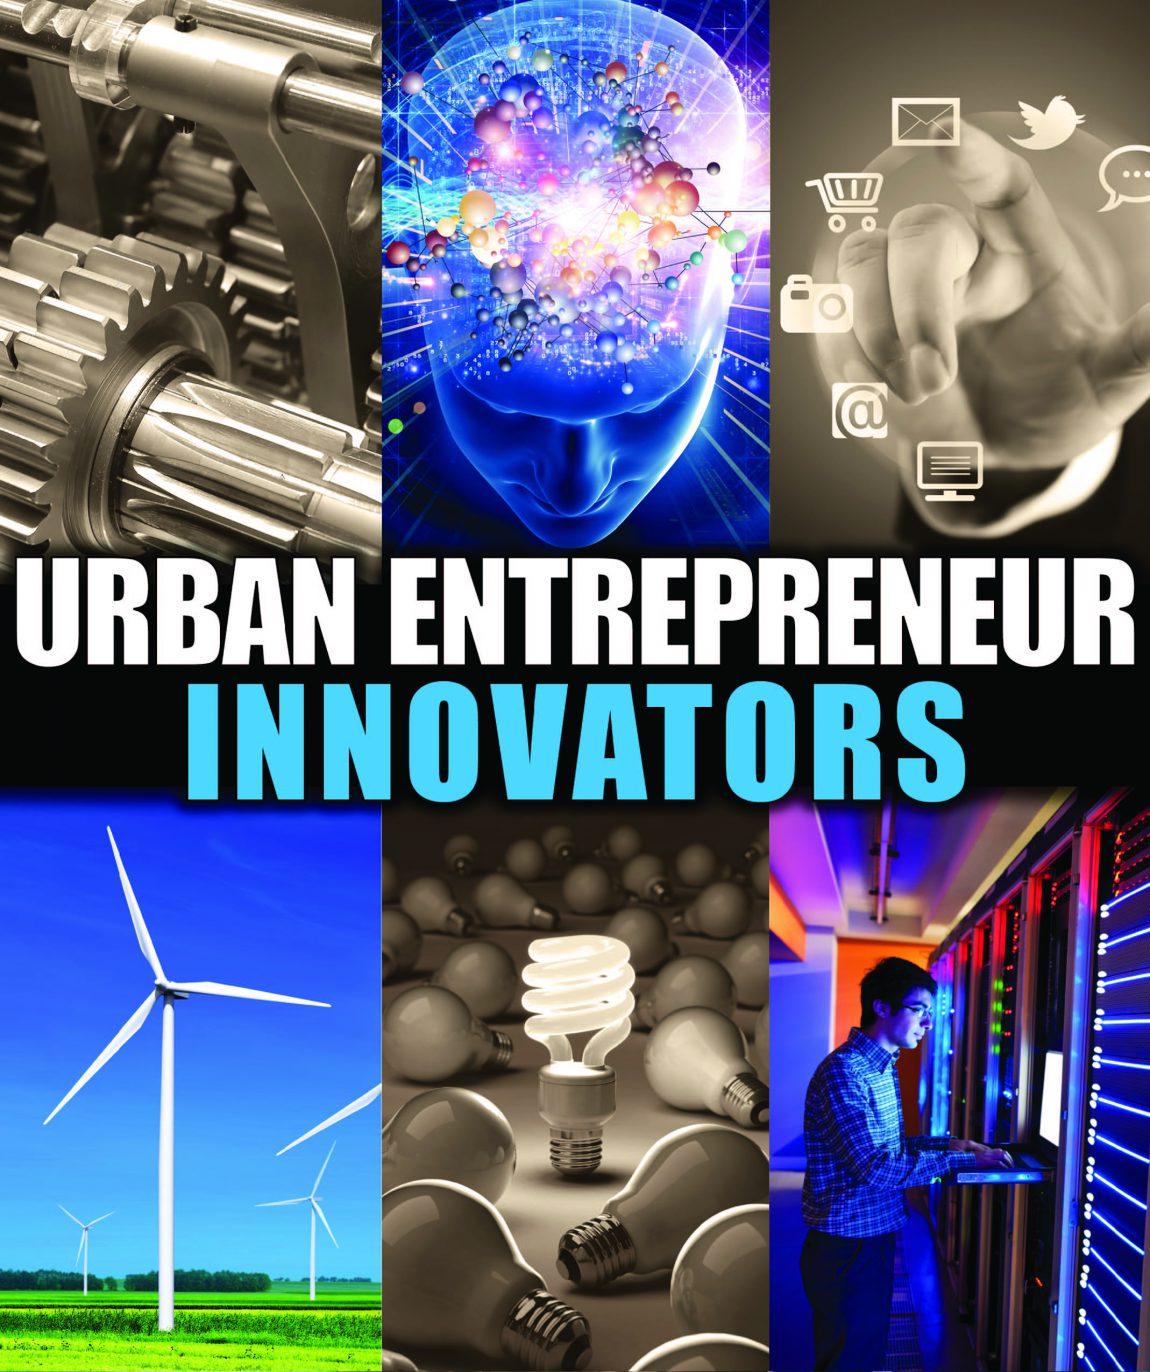 Innovators-1.jpg